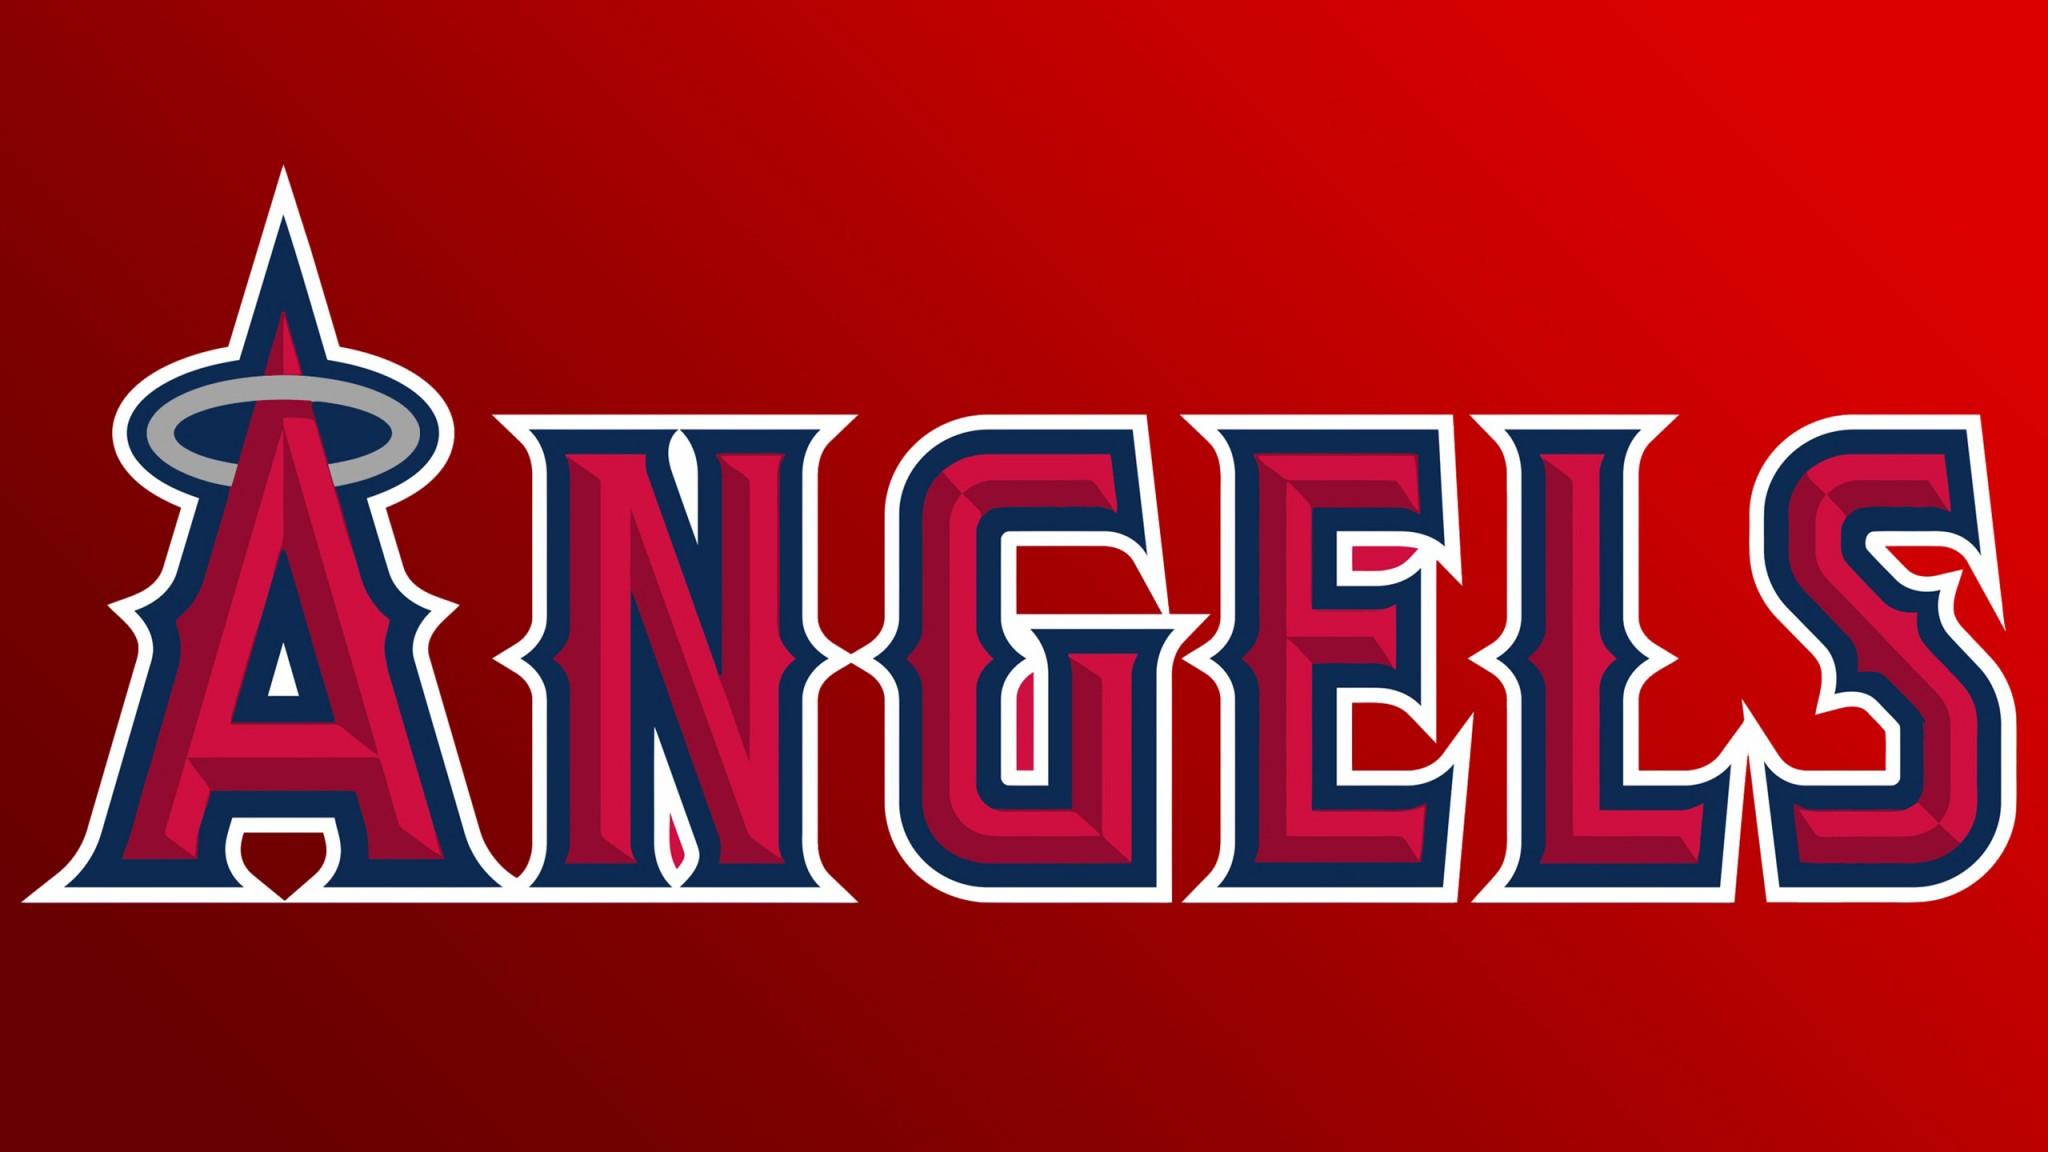 Los Angeles Angels Of Anaheim  Logo  Baseball    Feed HD Wallpaper